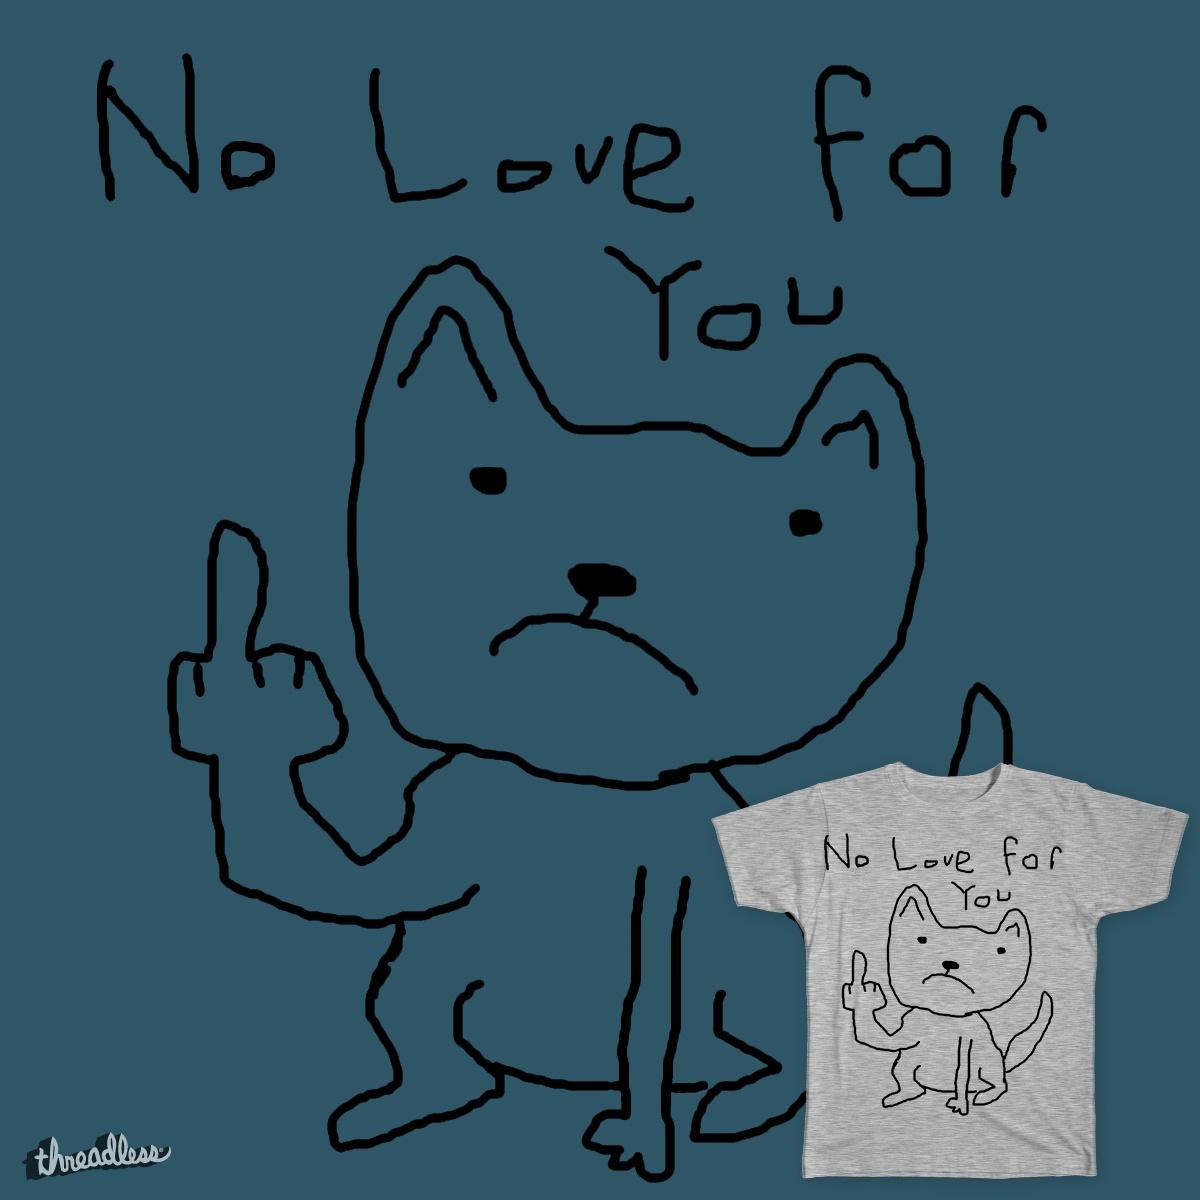 Unloving Cat by TetsuY on Threadless